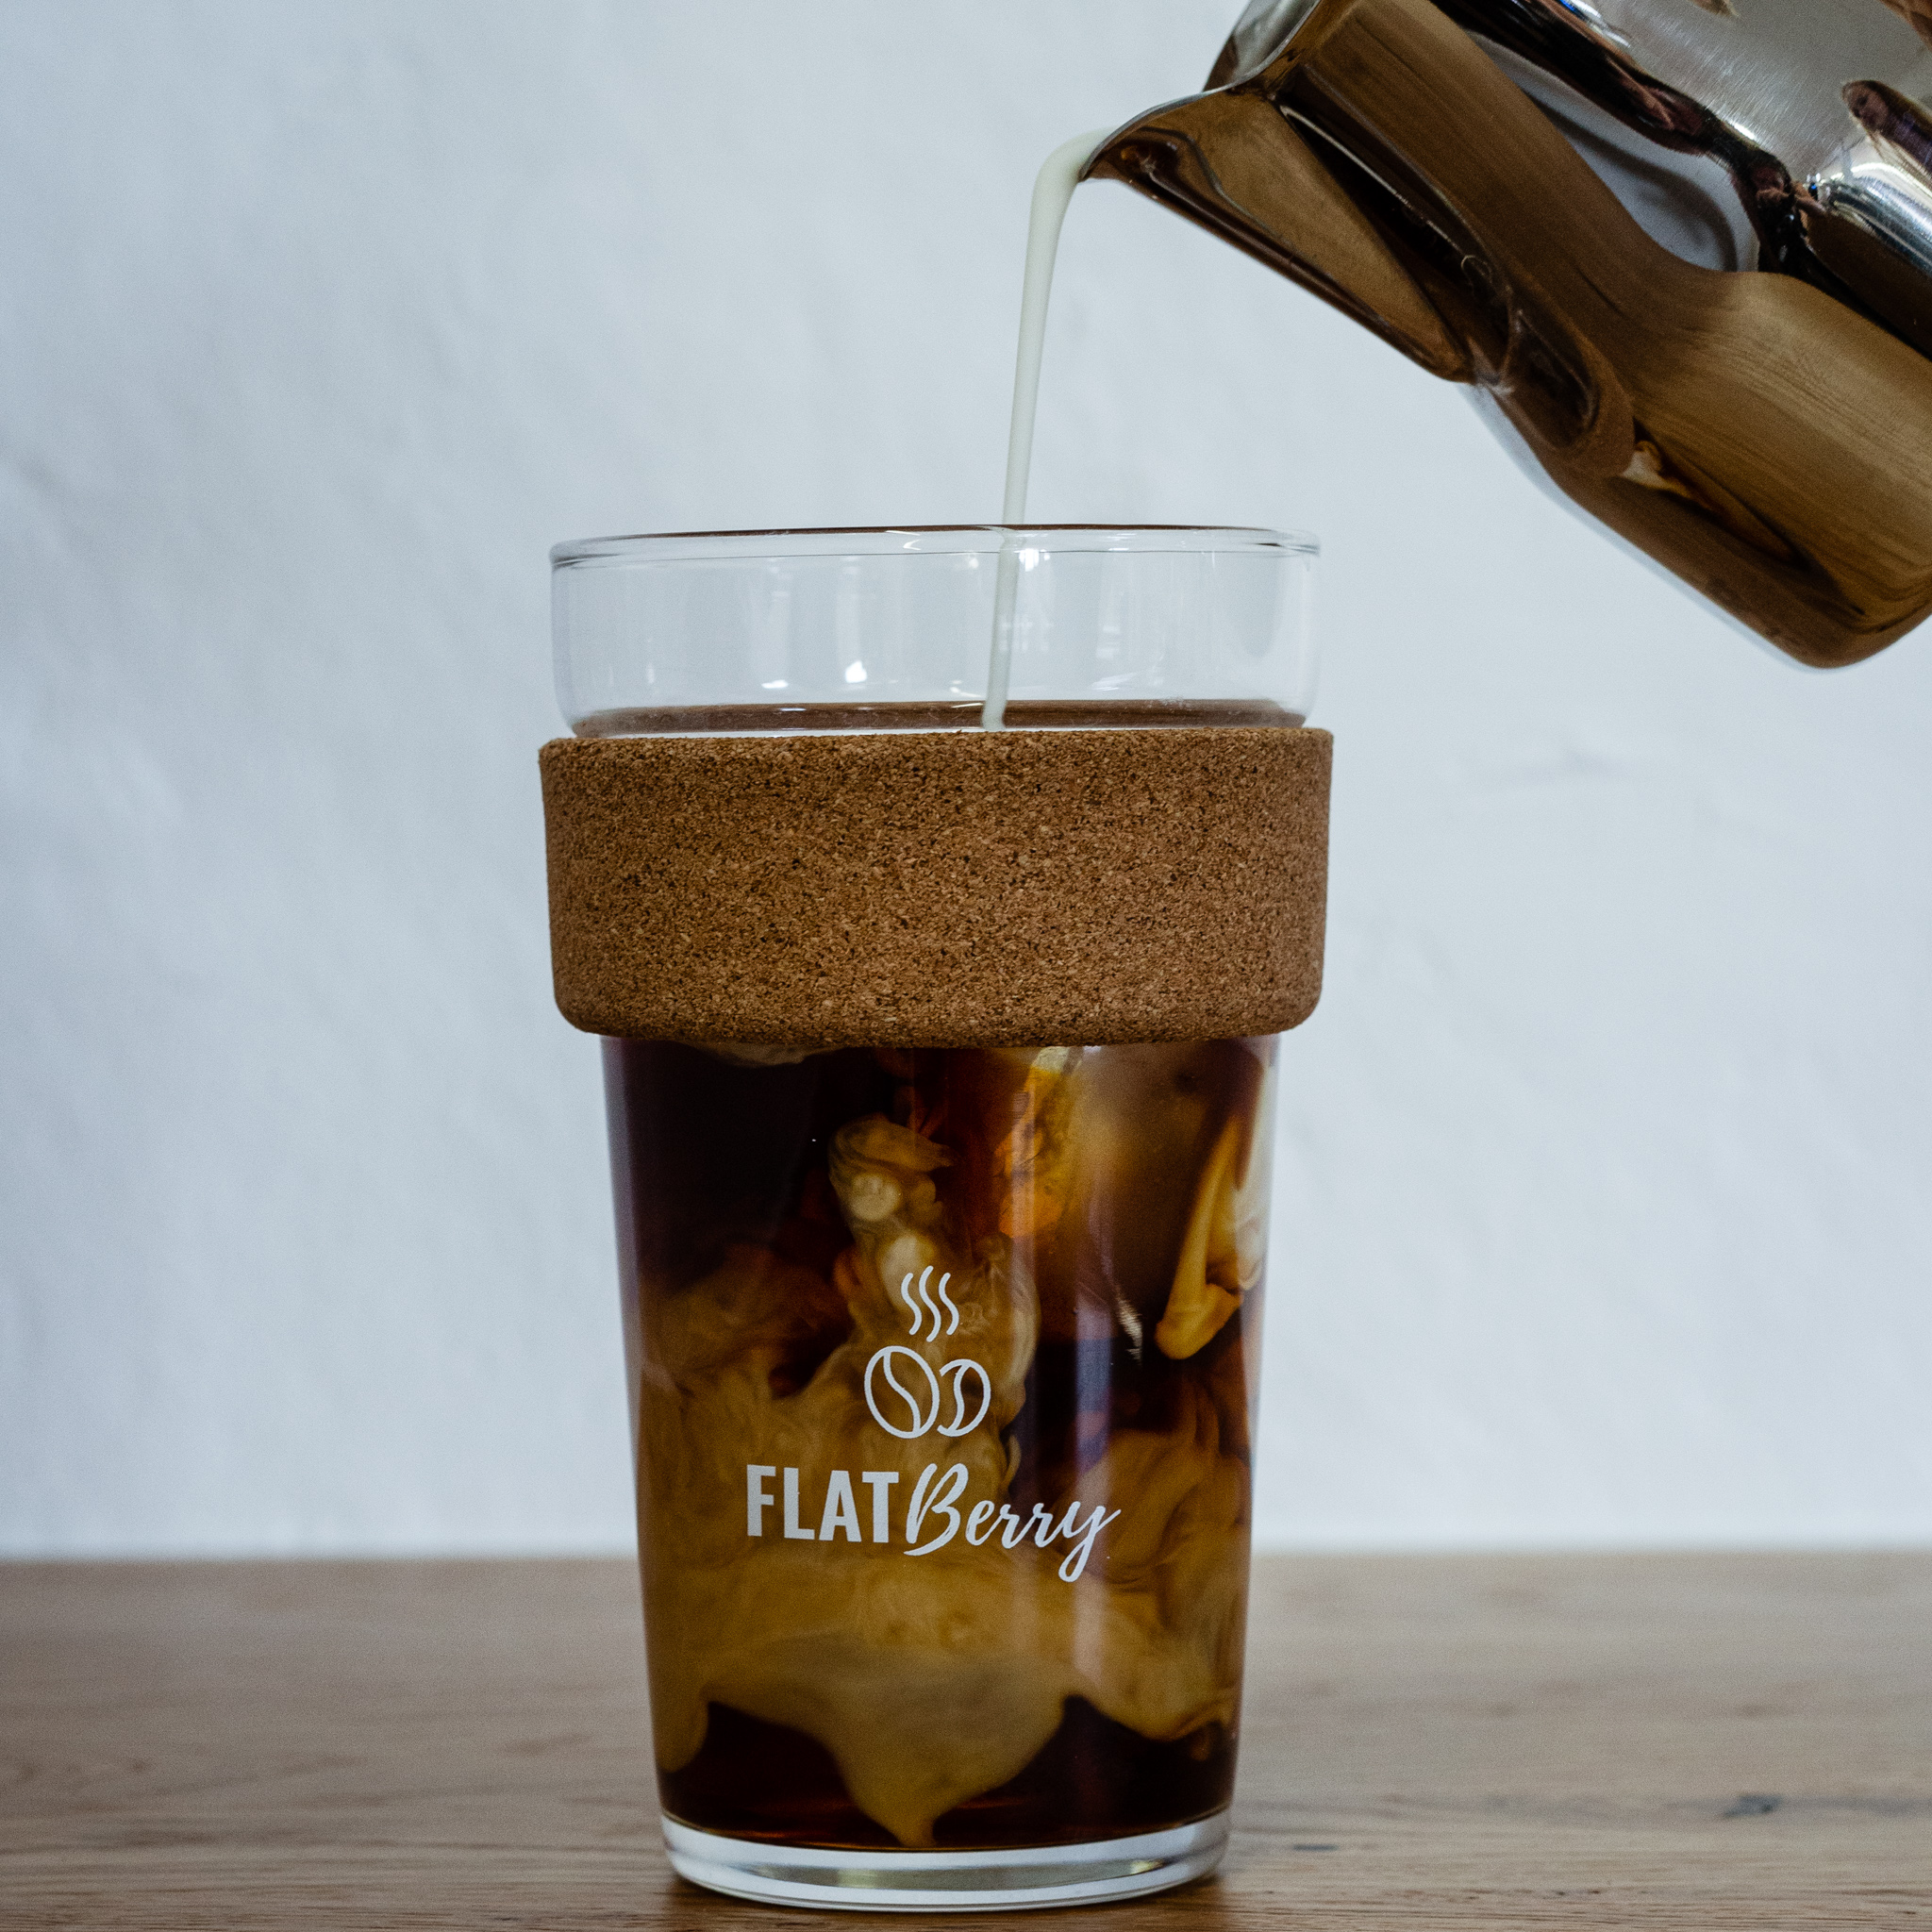 Flatberry Kaffee Cold Brew Kaffee